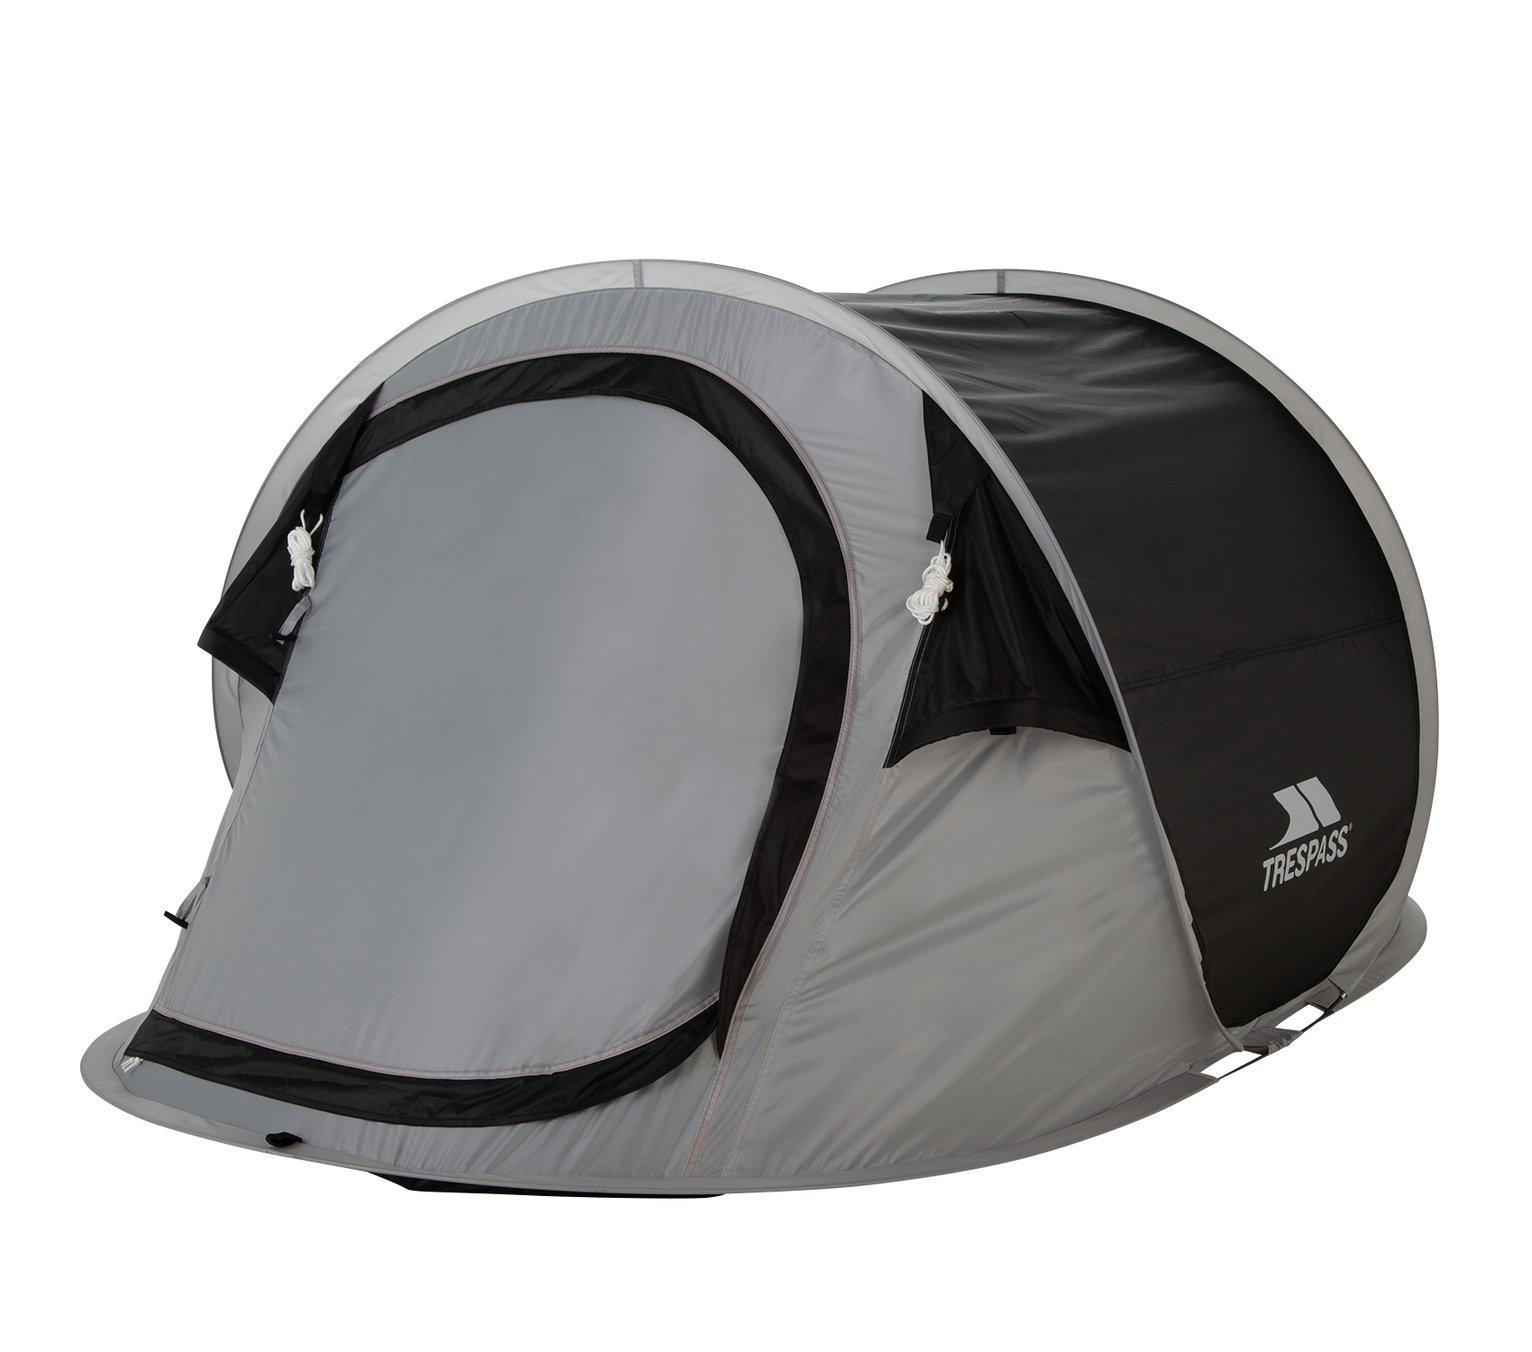 Trespass 2 Man 1 Room Festival Pop Up Tent Black  sc 1 st  Argos & Buy Trespass 2 Man 1 Room Festival Pop Up Tent Black   Tents   Argos